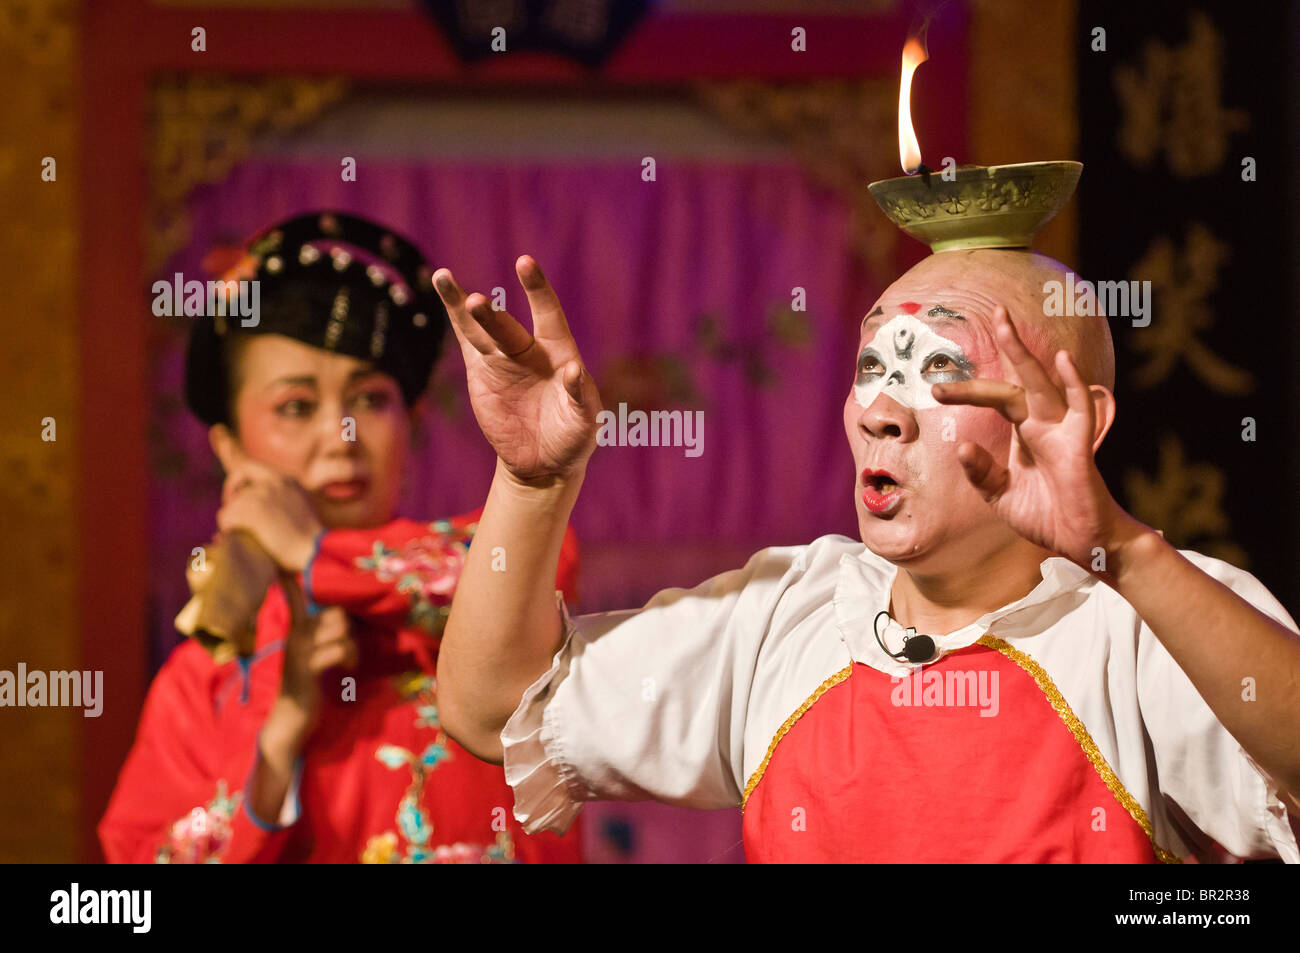 Actor balances oil lamp in Sichuan Opera at Shufenyayuan Tea House, Chengdu, Sichuan Province, China - Stock Image